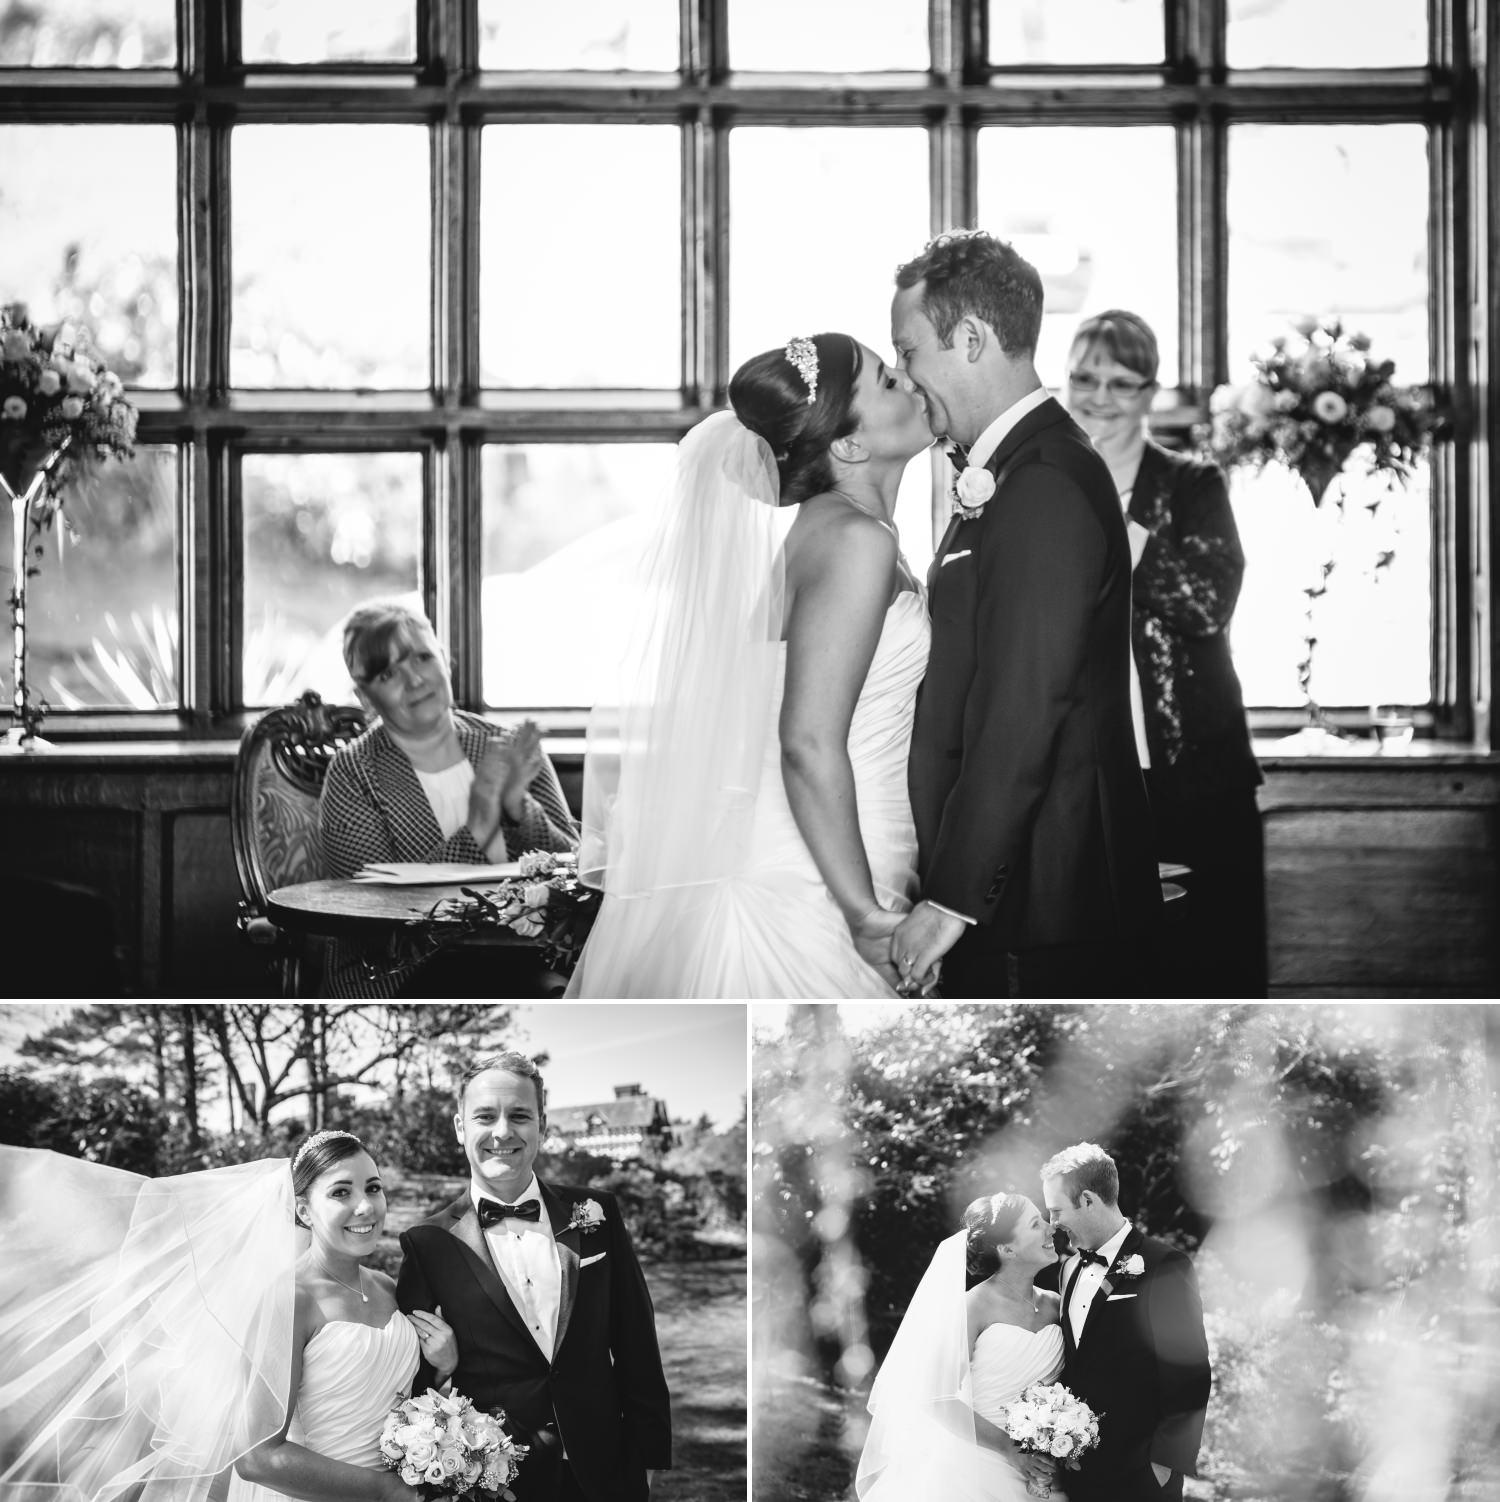 First kiss photograph at Hillbark hotel wedding venue